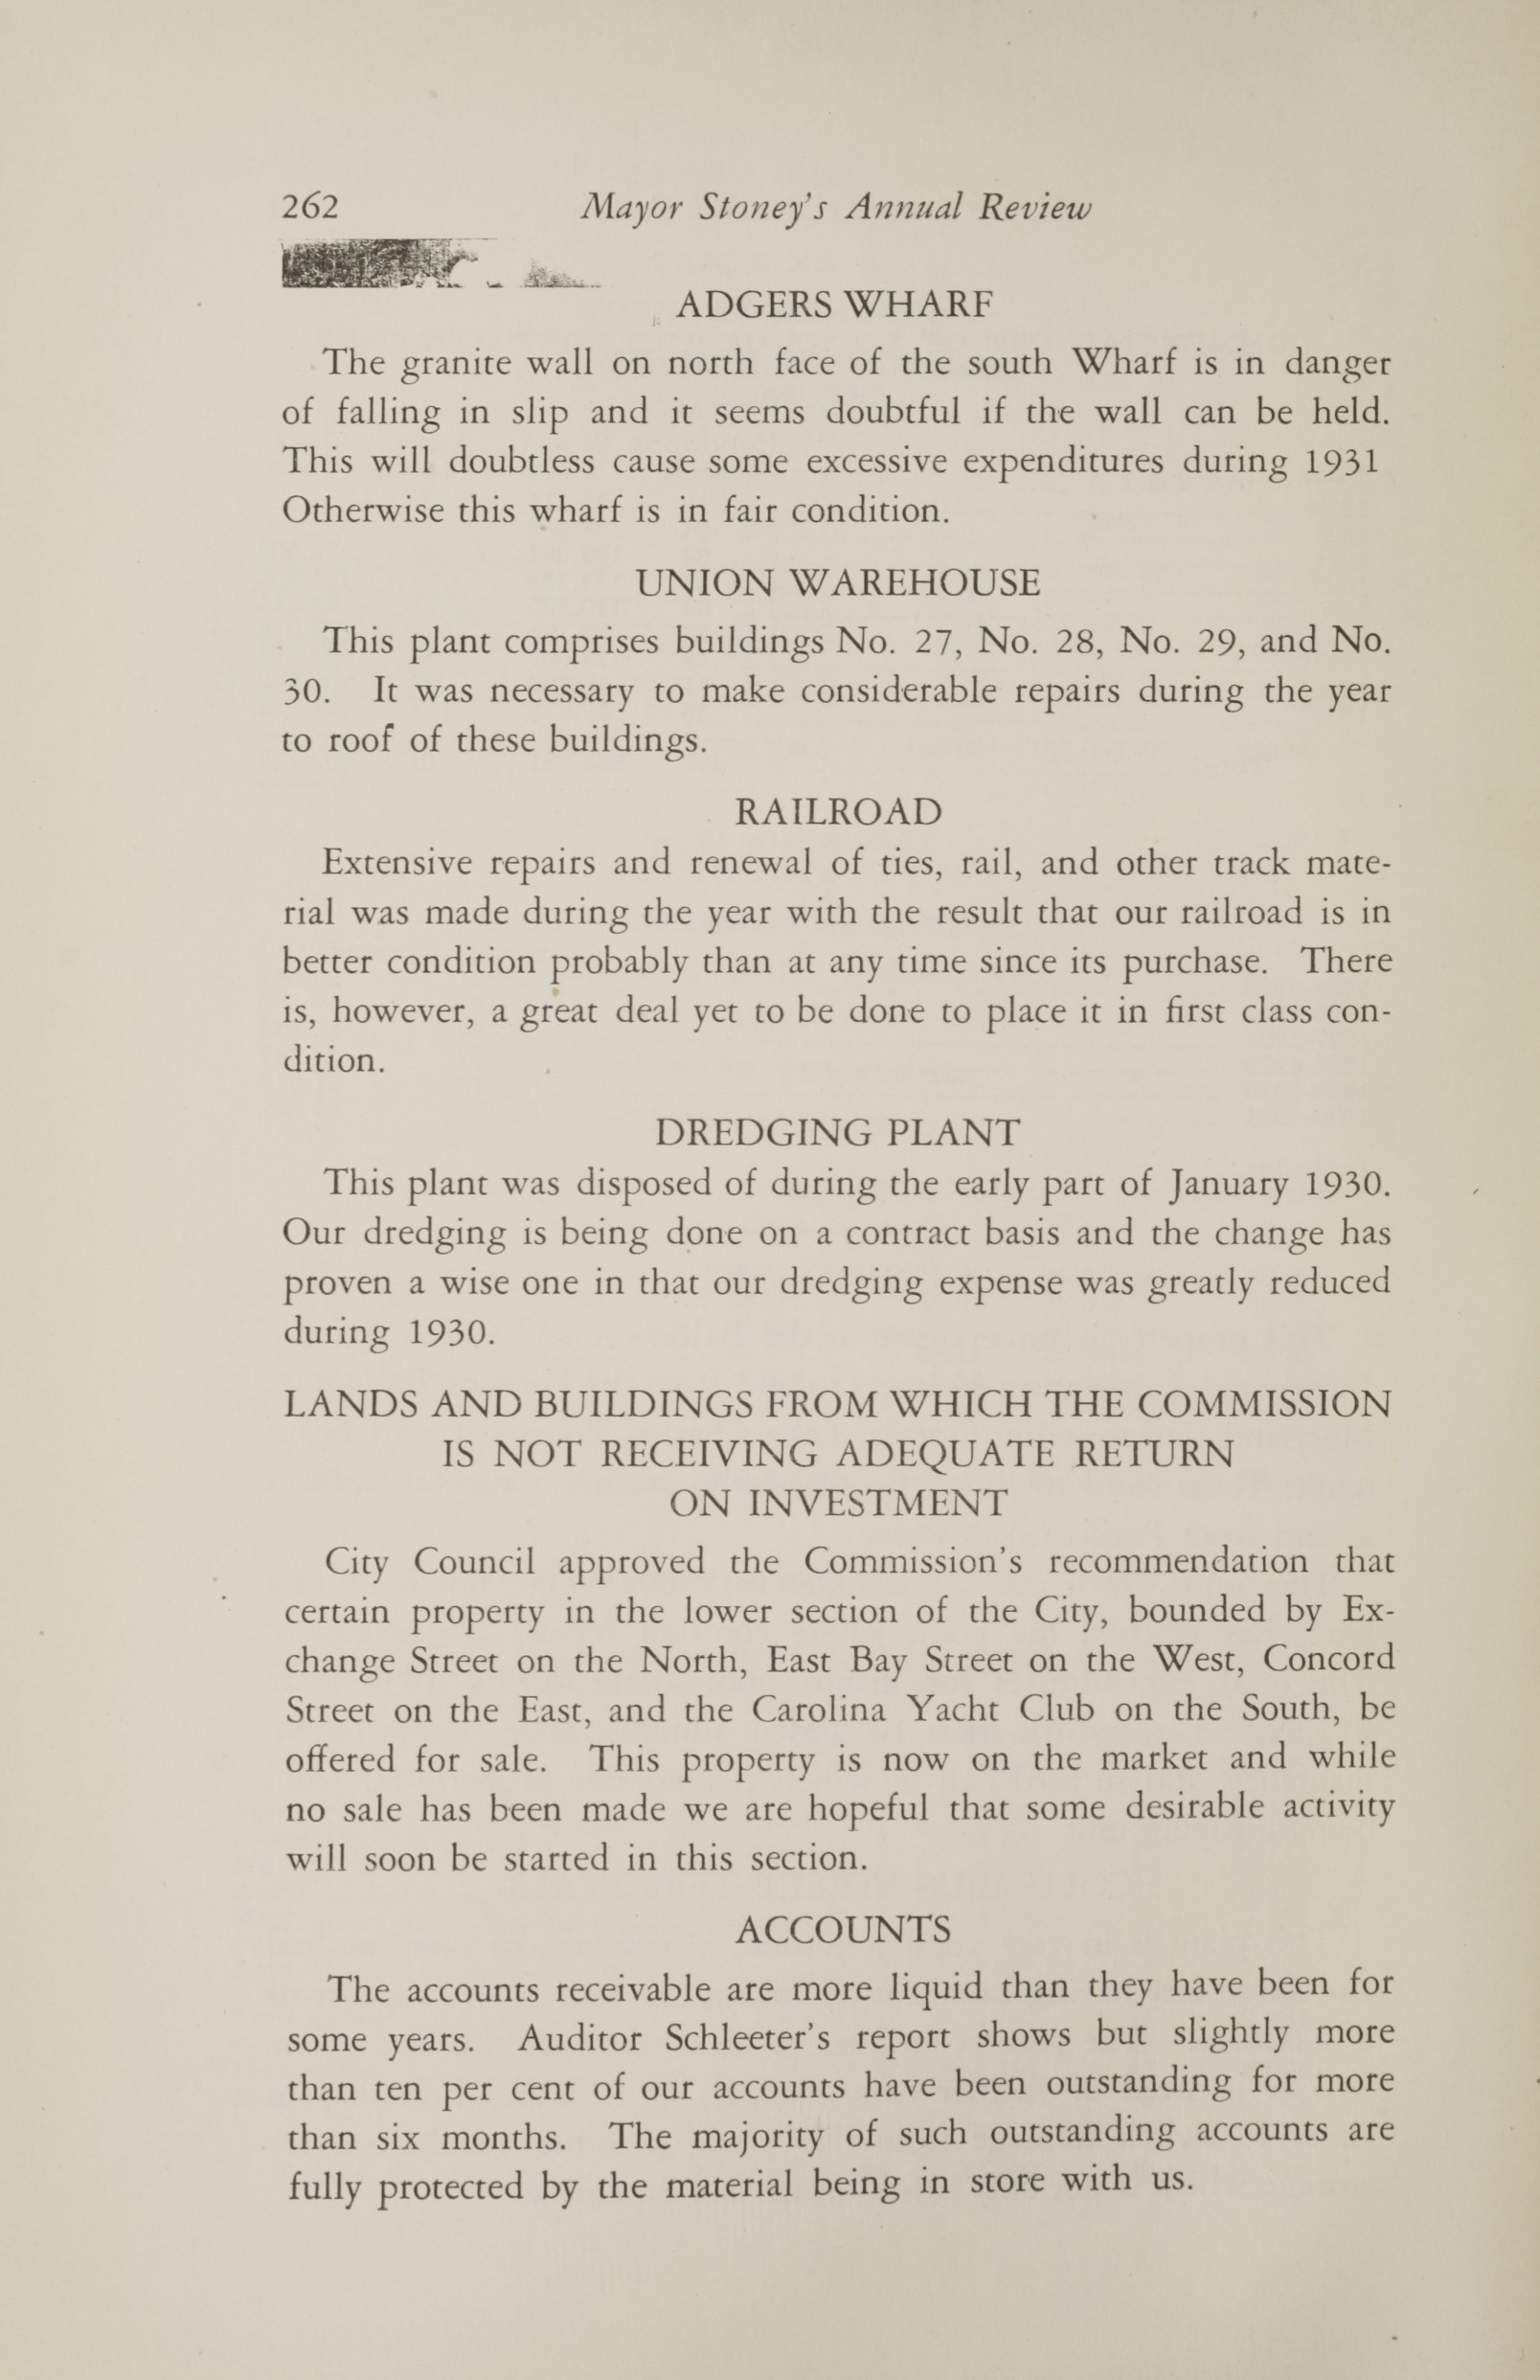 Charleston Yearbook, 1930, page 262